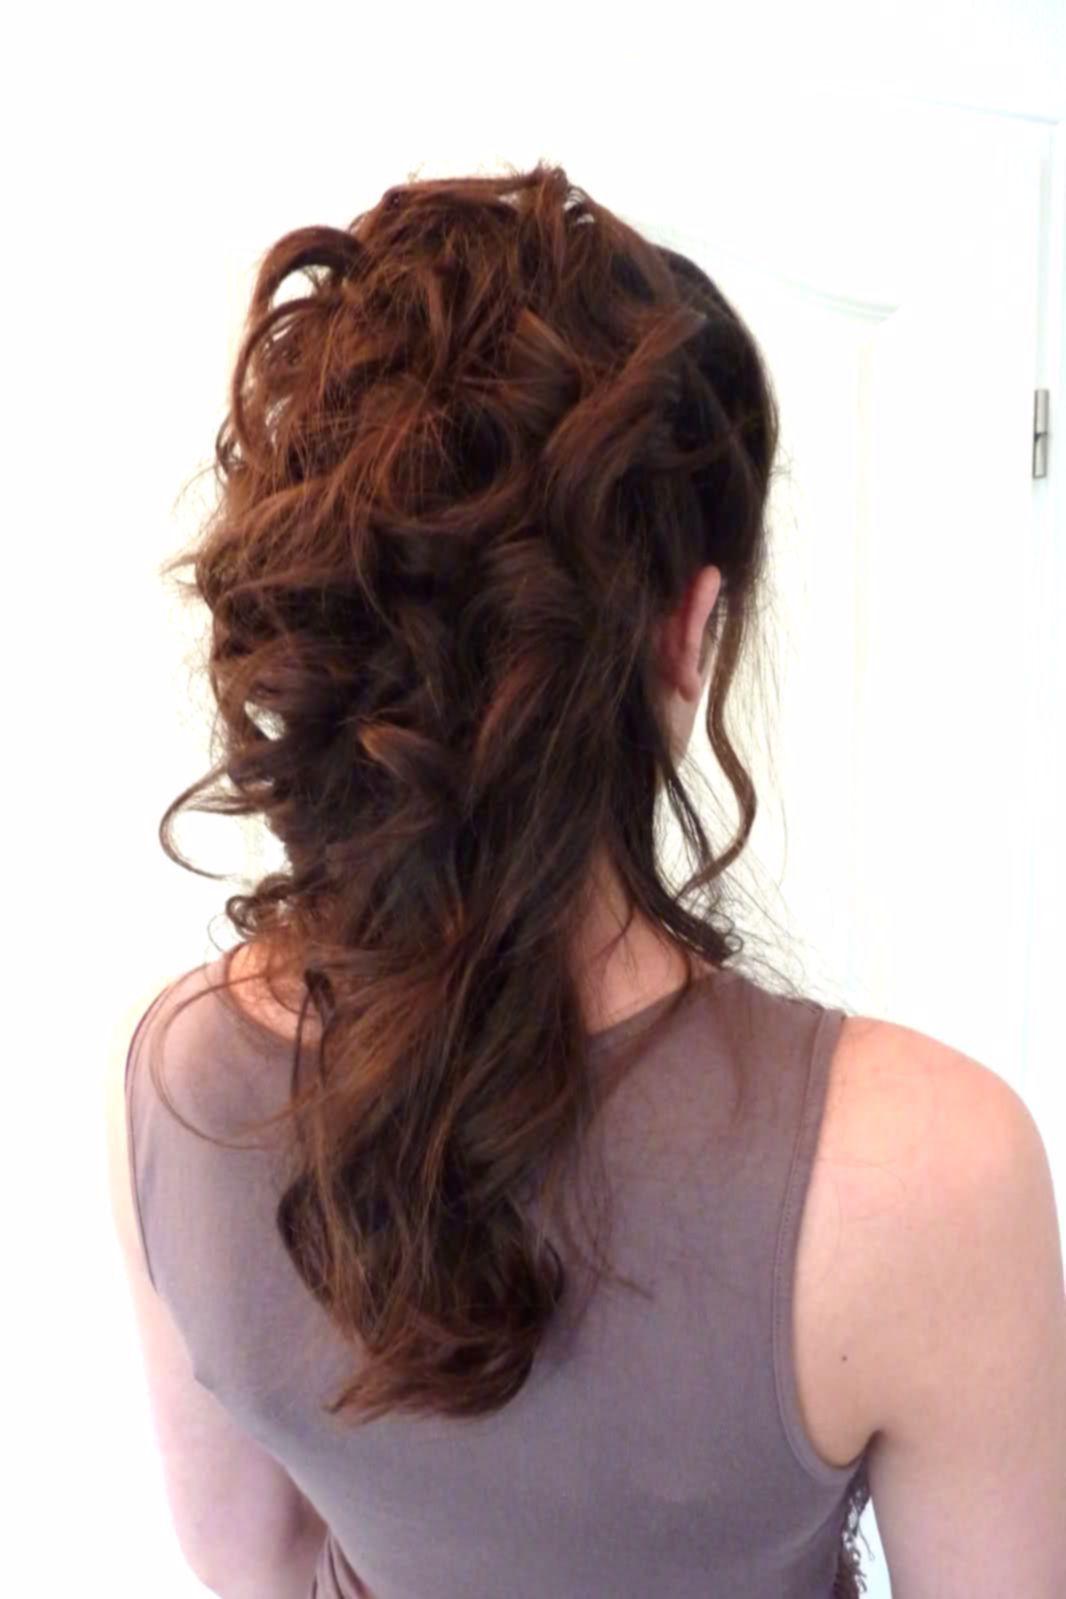 Hair Open Haar Haar Hair Open Hairstyles For Medium Length Hair Open Hairstyle Hair Open Hair Hair Hair O In 2020 Hair Styles Open Hairstyles Hair Lengths